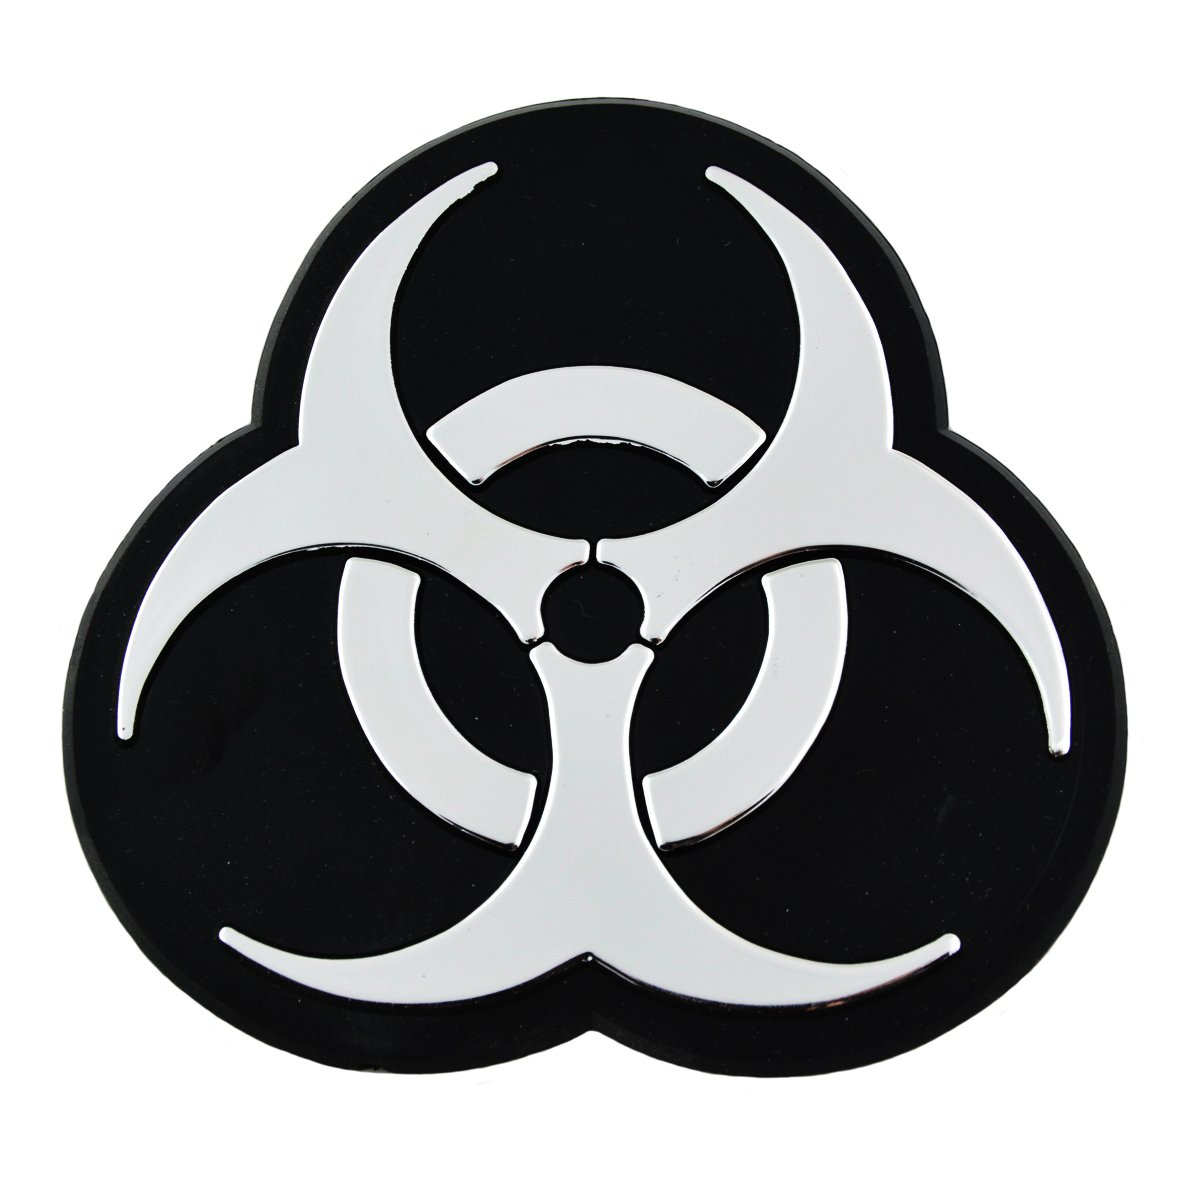 4 x 4 EvolveFISH EF-EMB-P-00001 Biohazard Chrome Auto Emblem